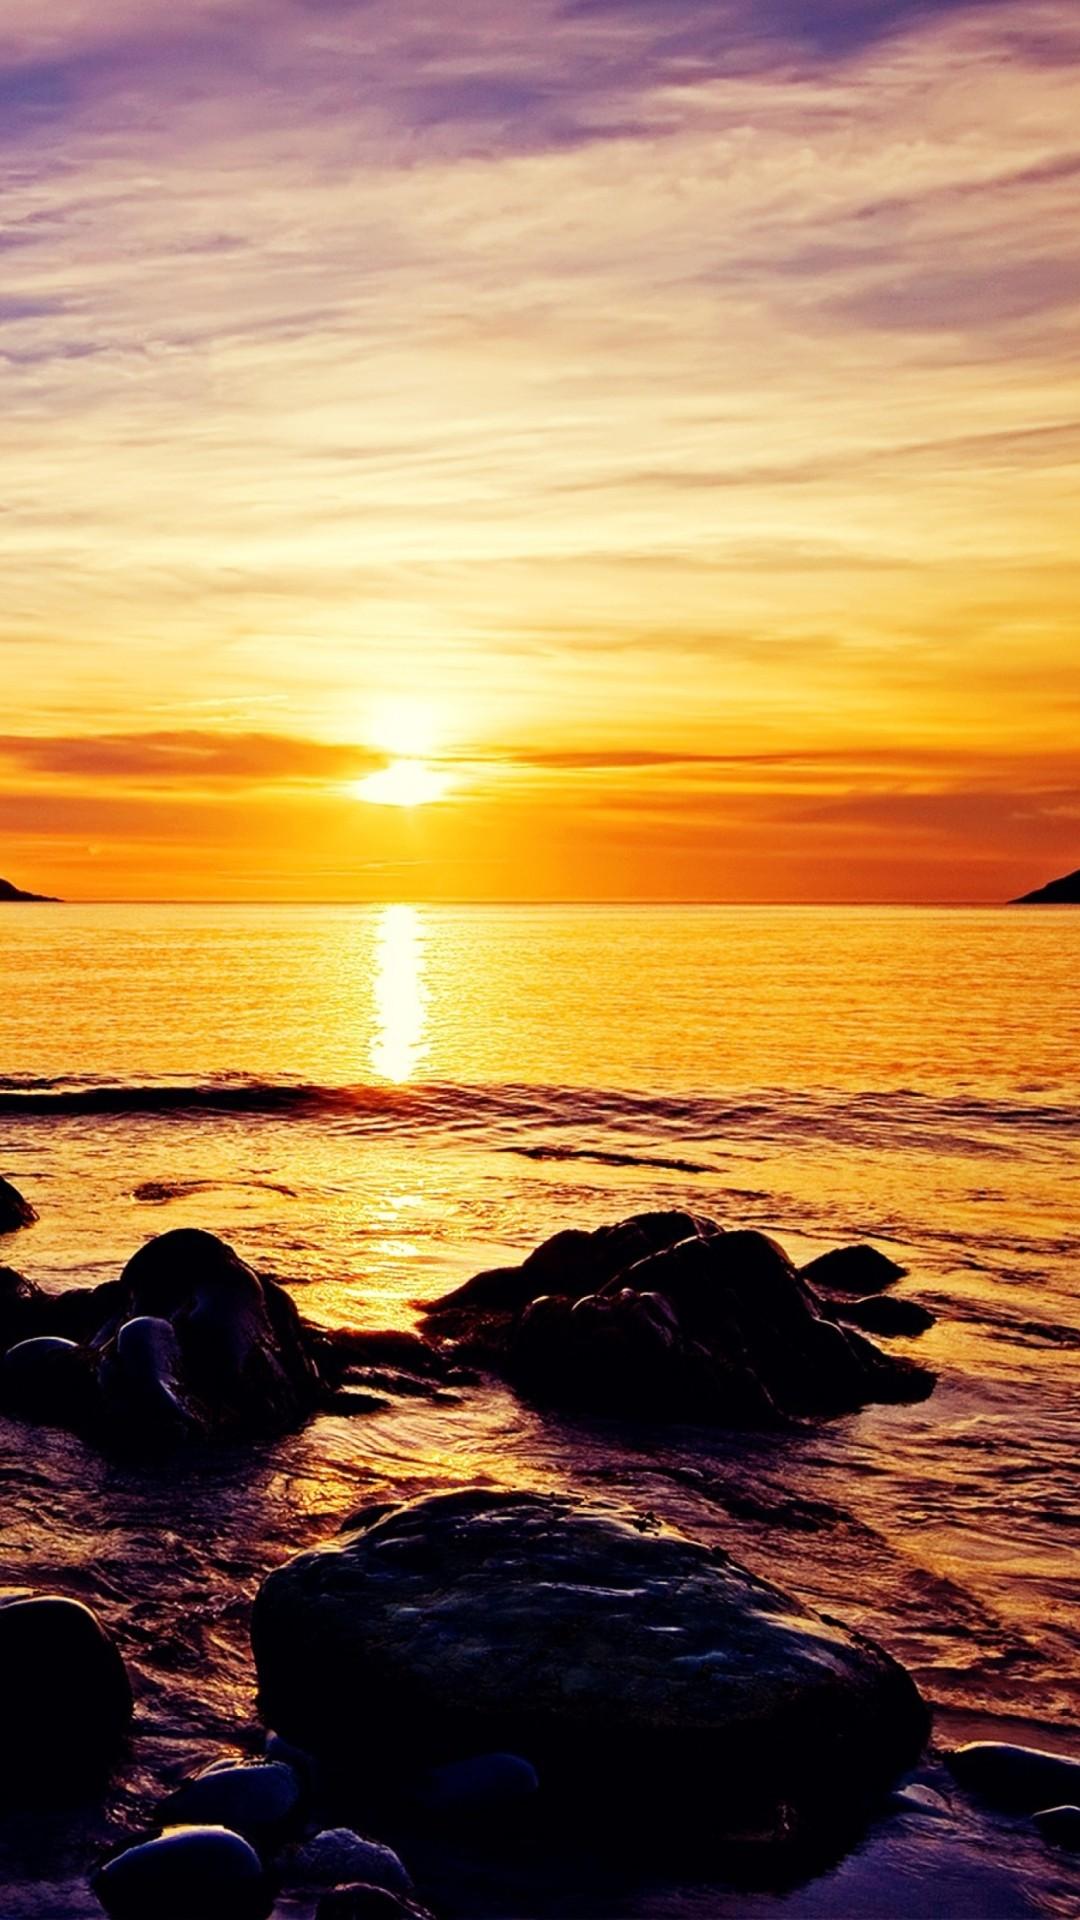 Sunrise iPhone 5 wallpaper